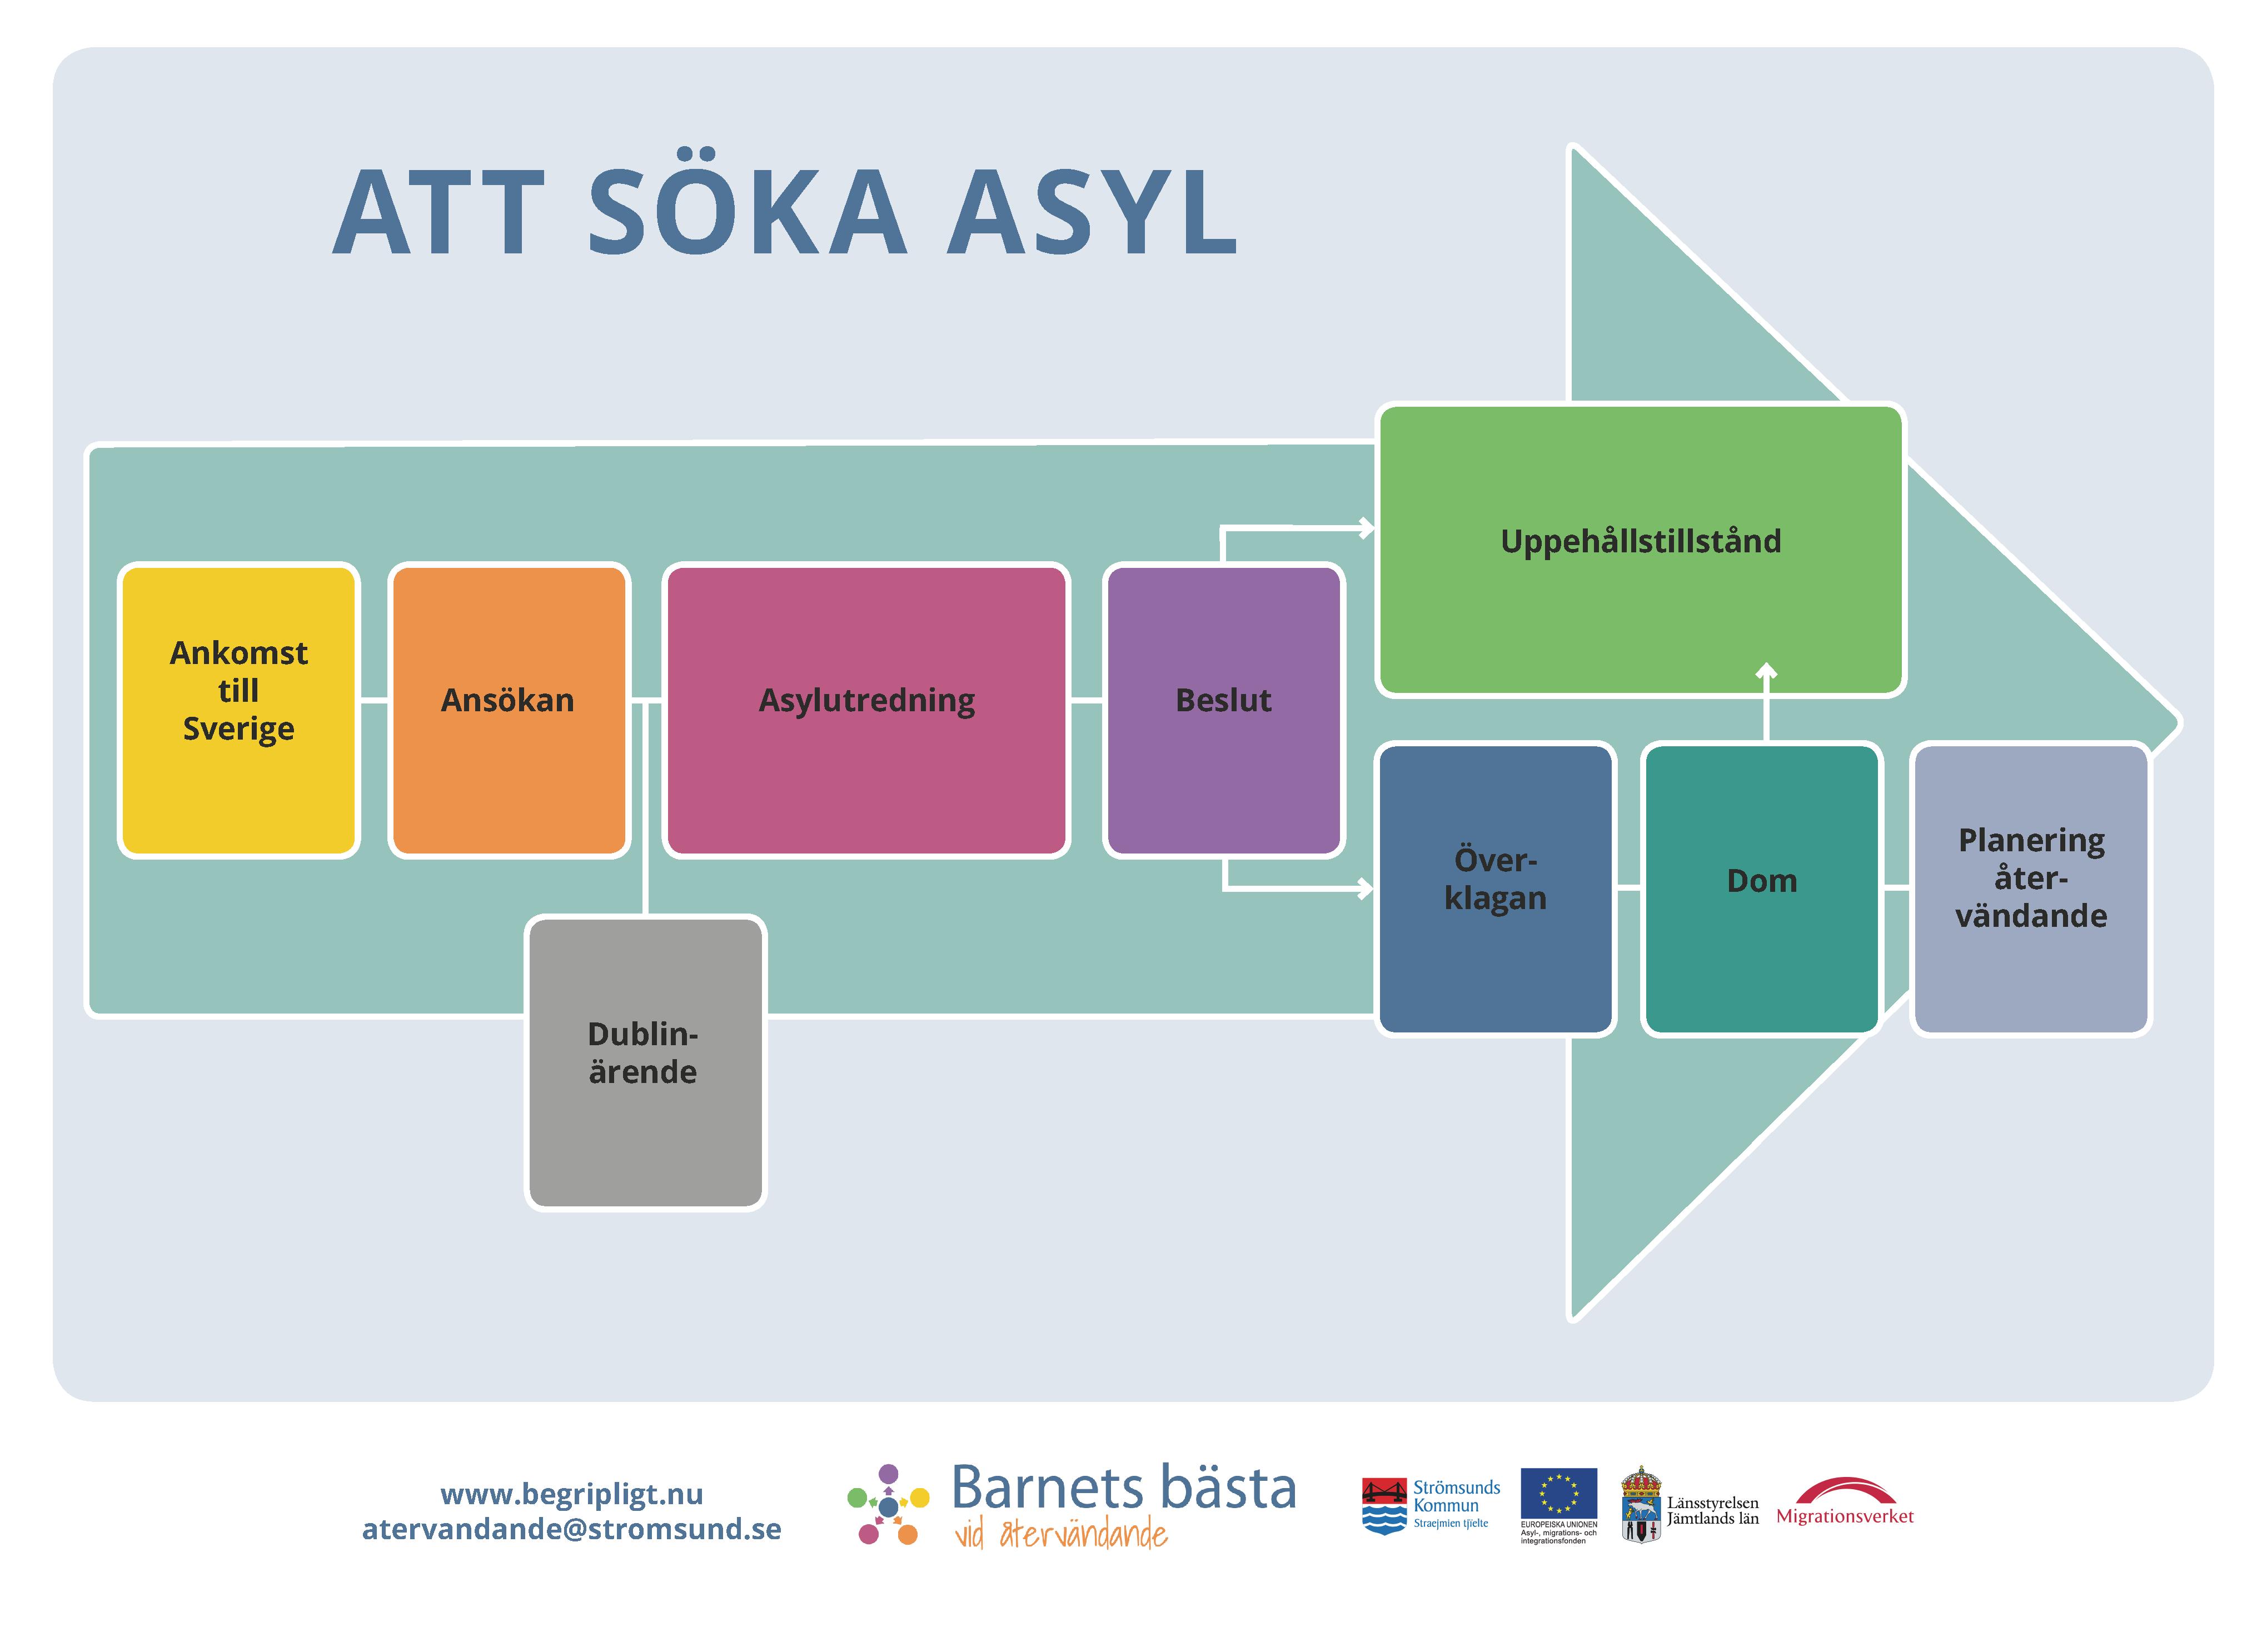 Interaktiv karta över asylprocessen